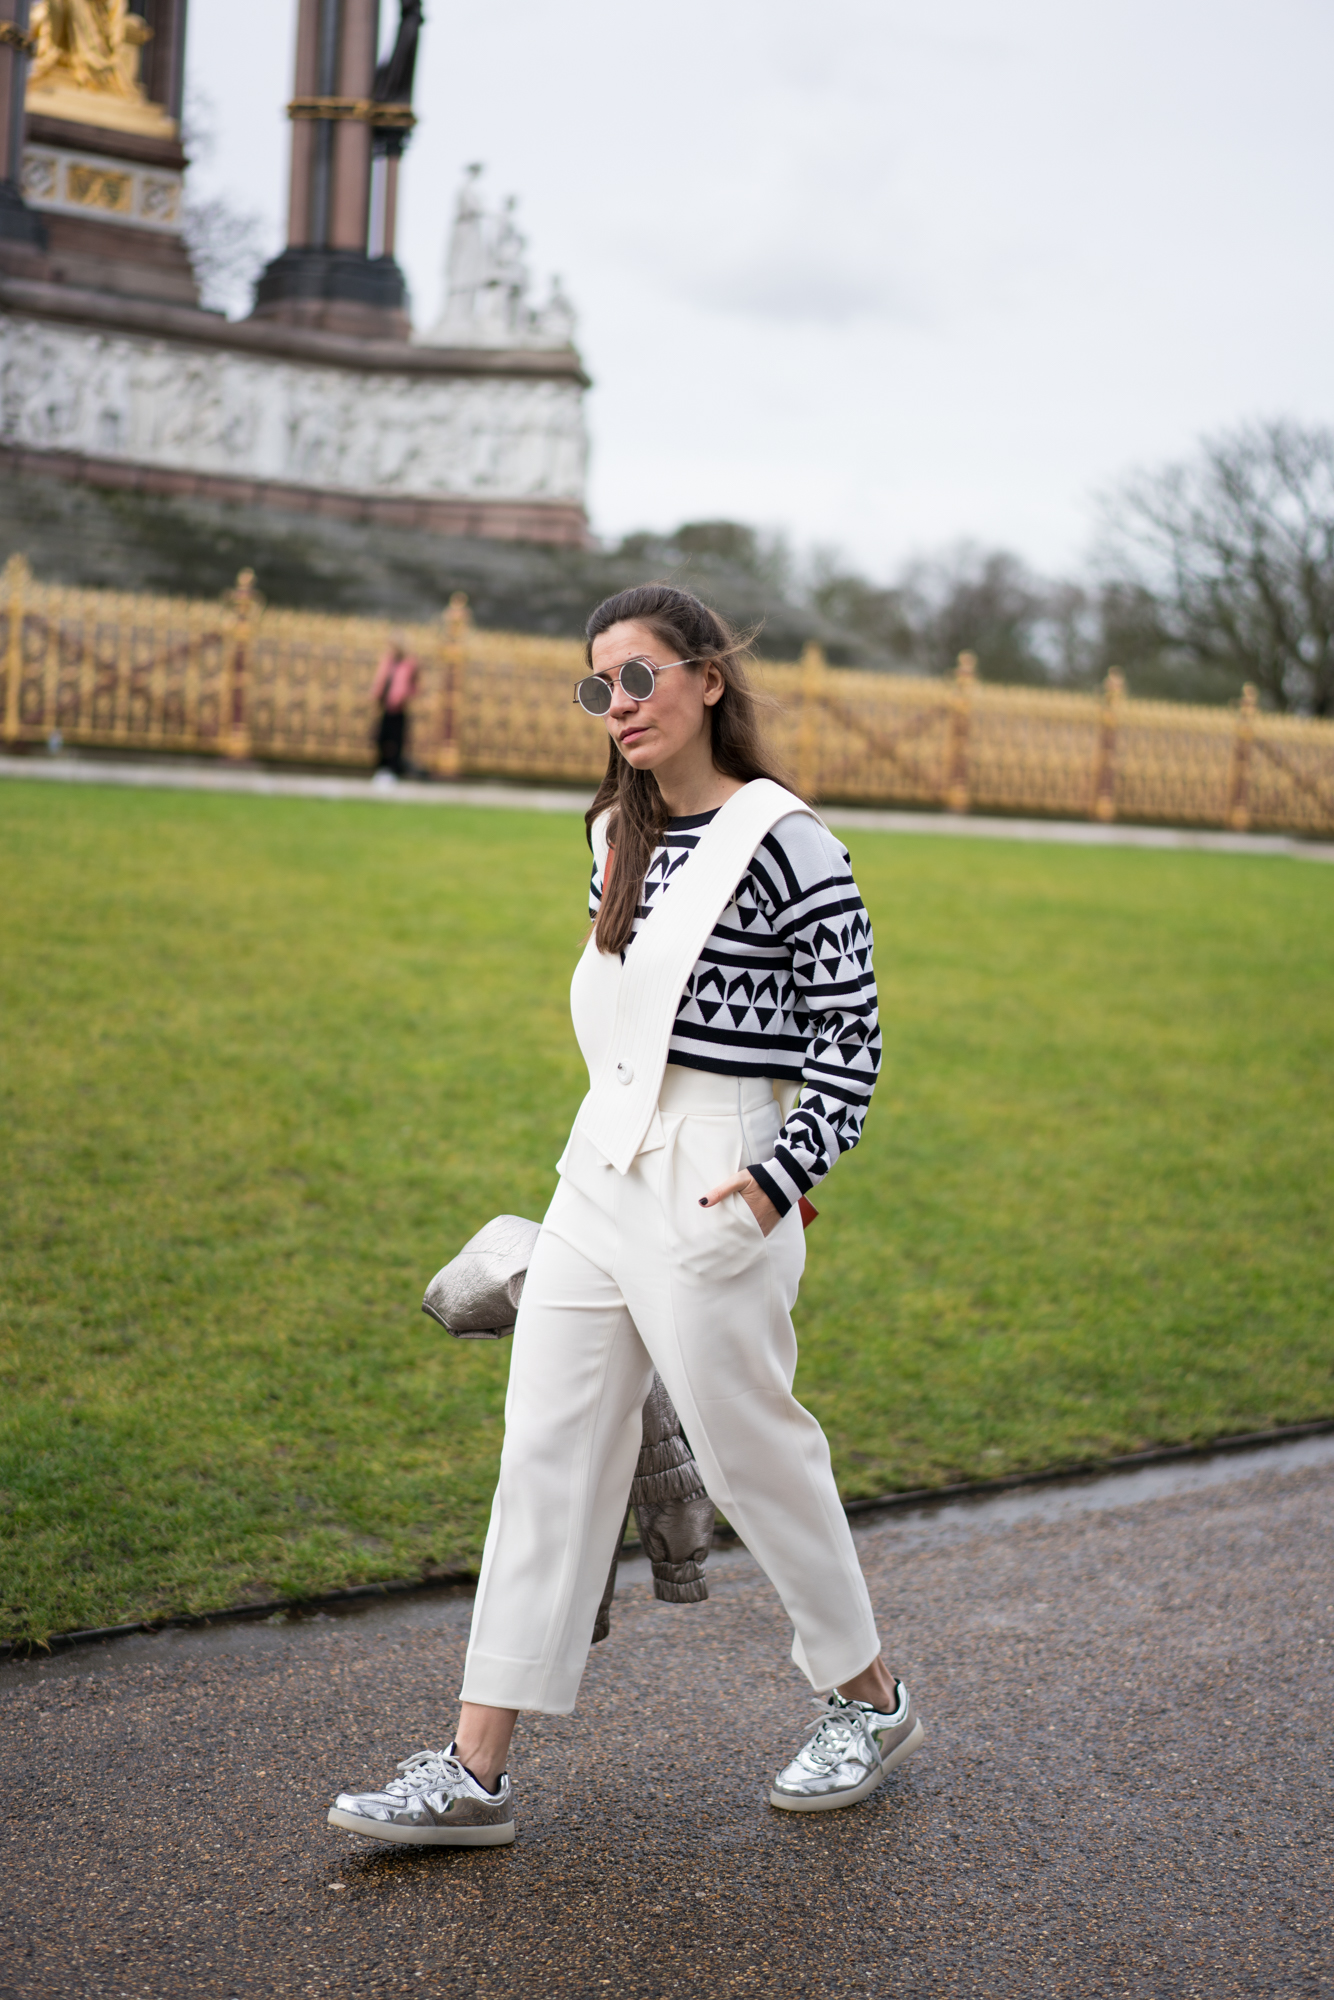 lfw, street style, london fashion week, sunglass hut, style, fashion, turkish style blogger, billur saatci, off ne giysem, mybestfriends, jumpsuit, bomber jacket, dun, house of holland, wise and ope, turkish style blogger, burberry, after burberry show, before burberry show